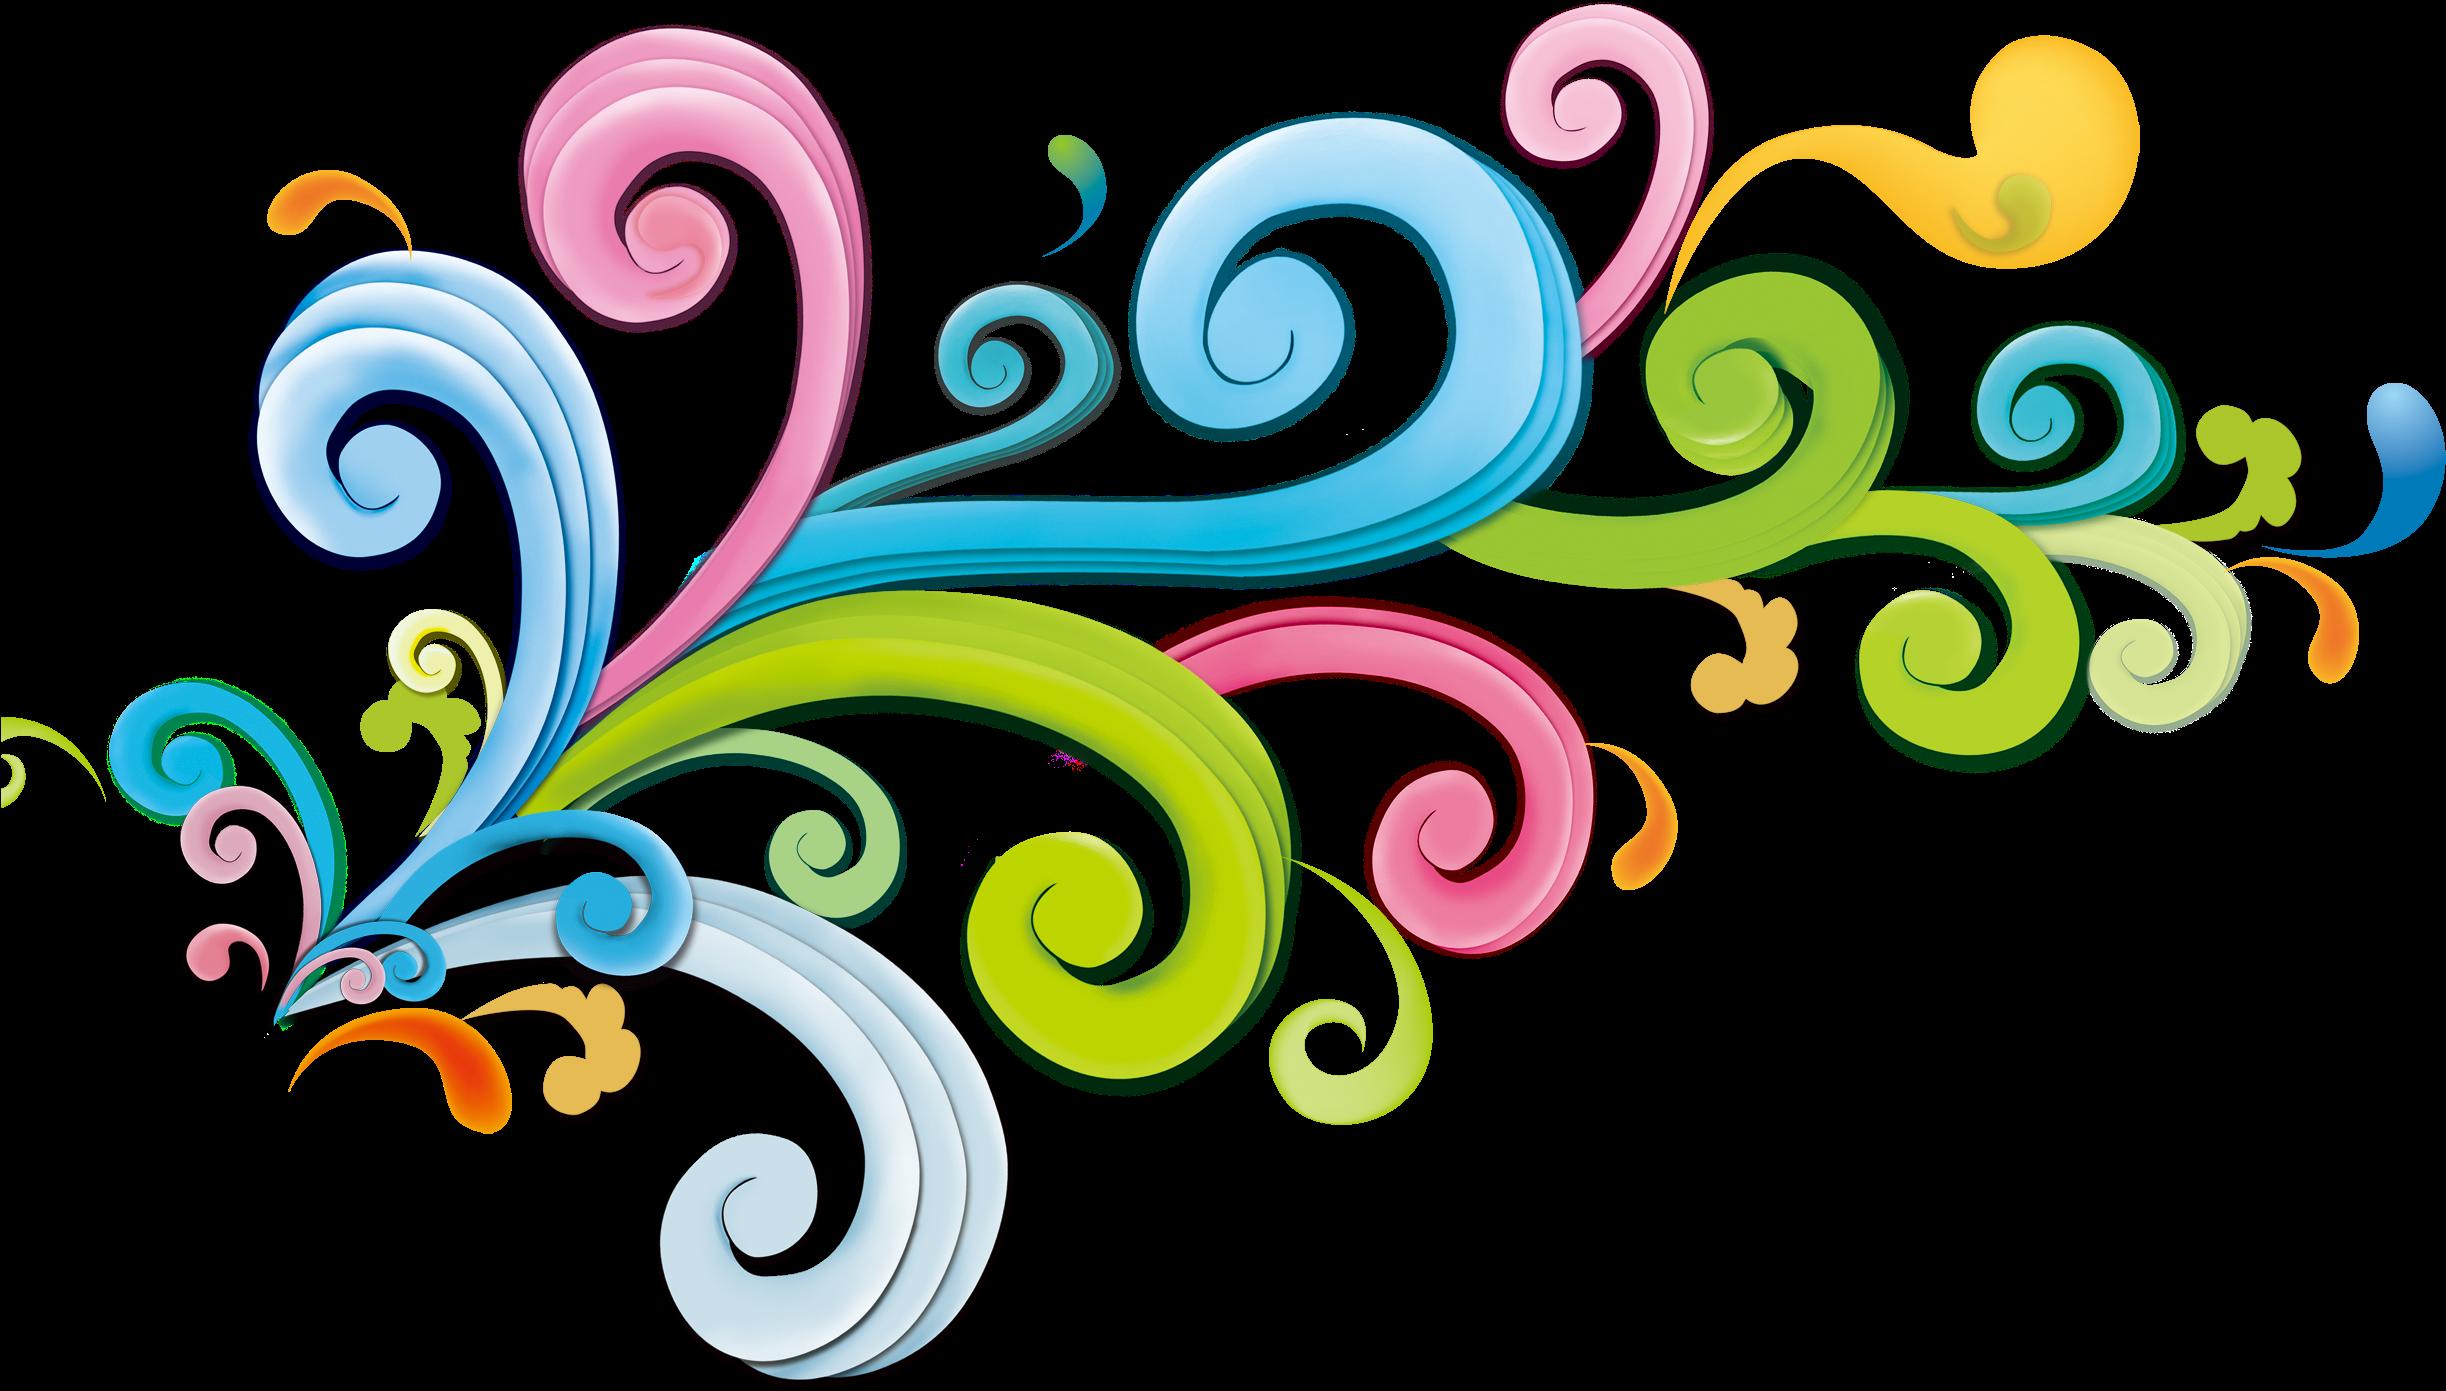 Transparent curly design clipart - Decorative Clipart Curly - Creative Graphics Design Background